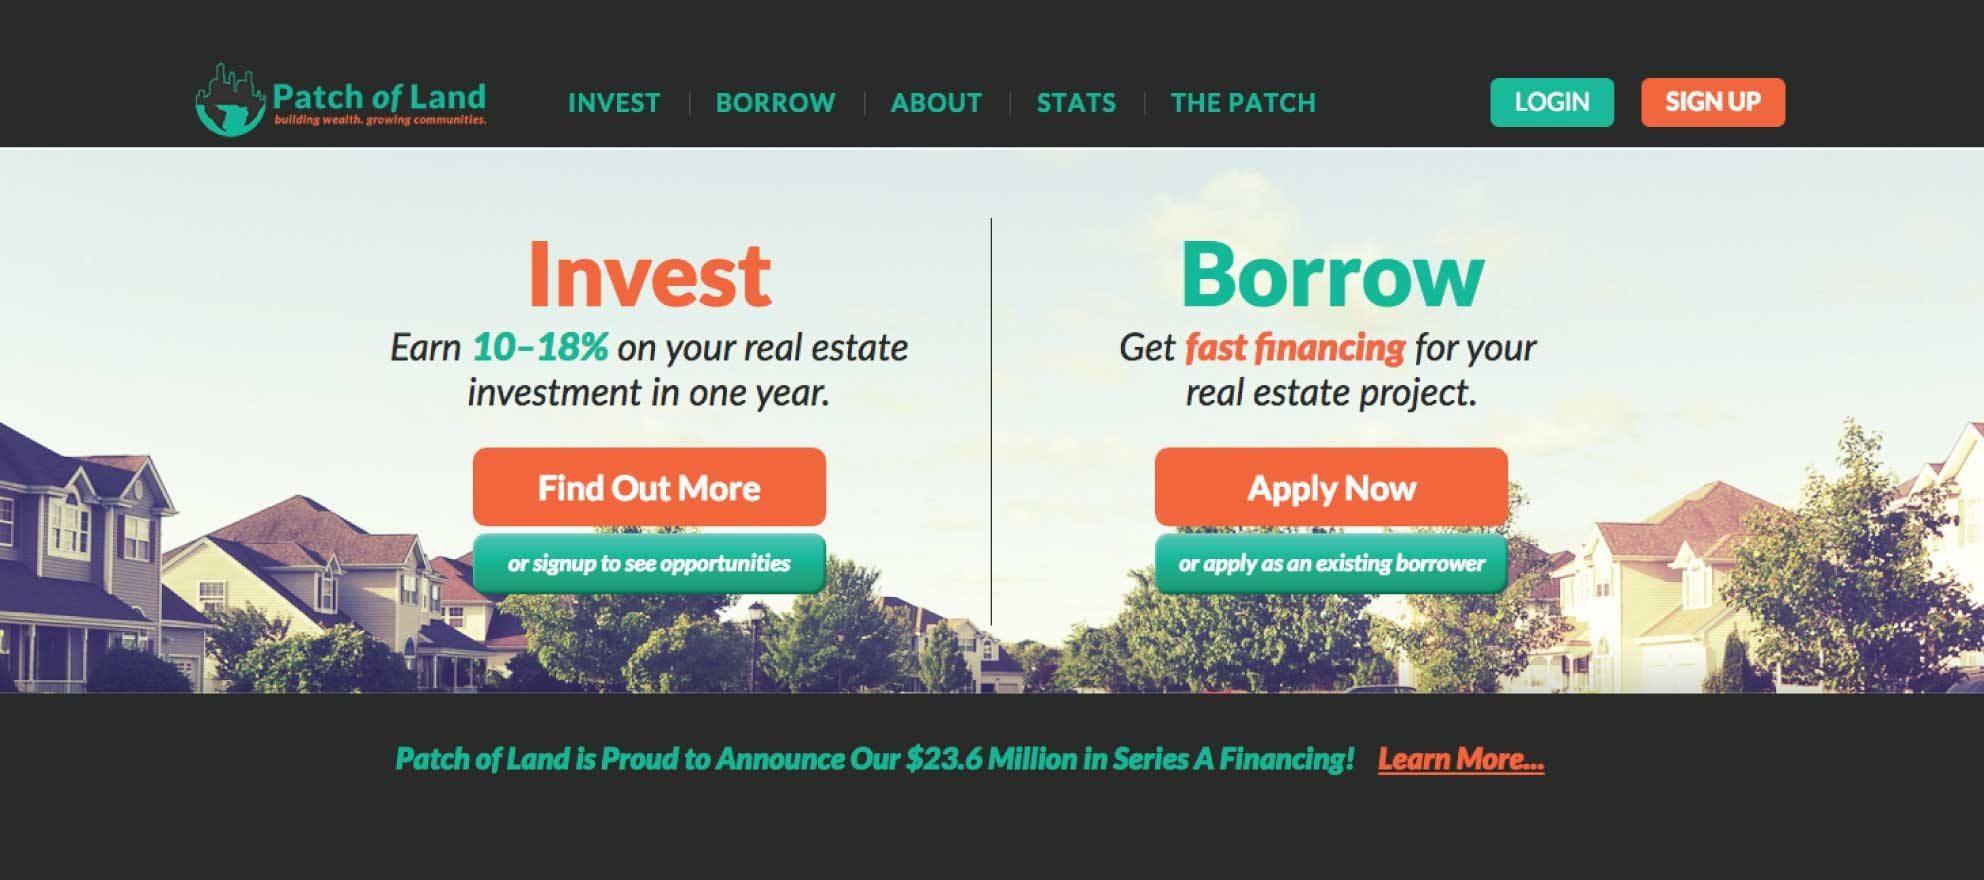 Real estate crowdfunder raises $23.6M